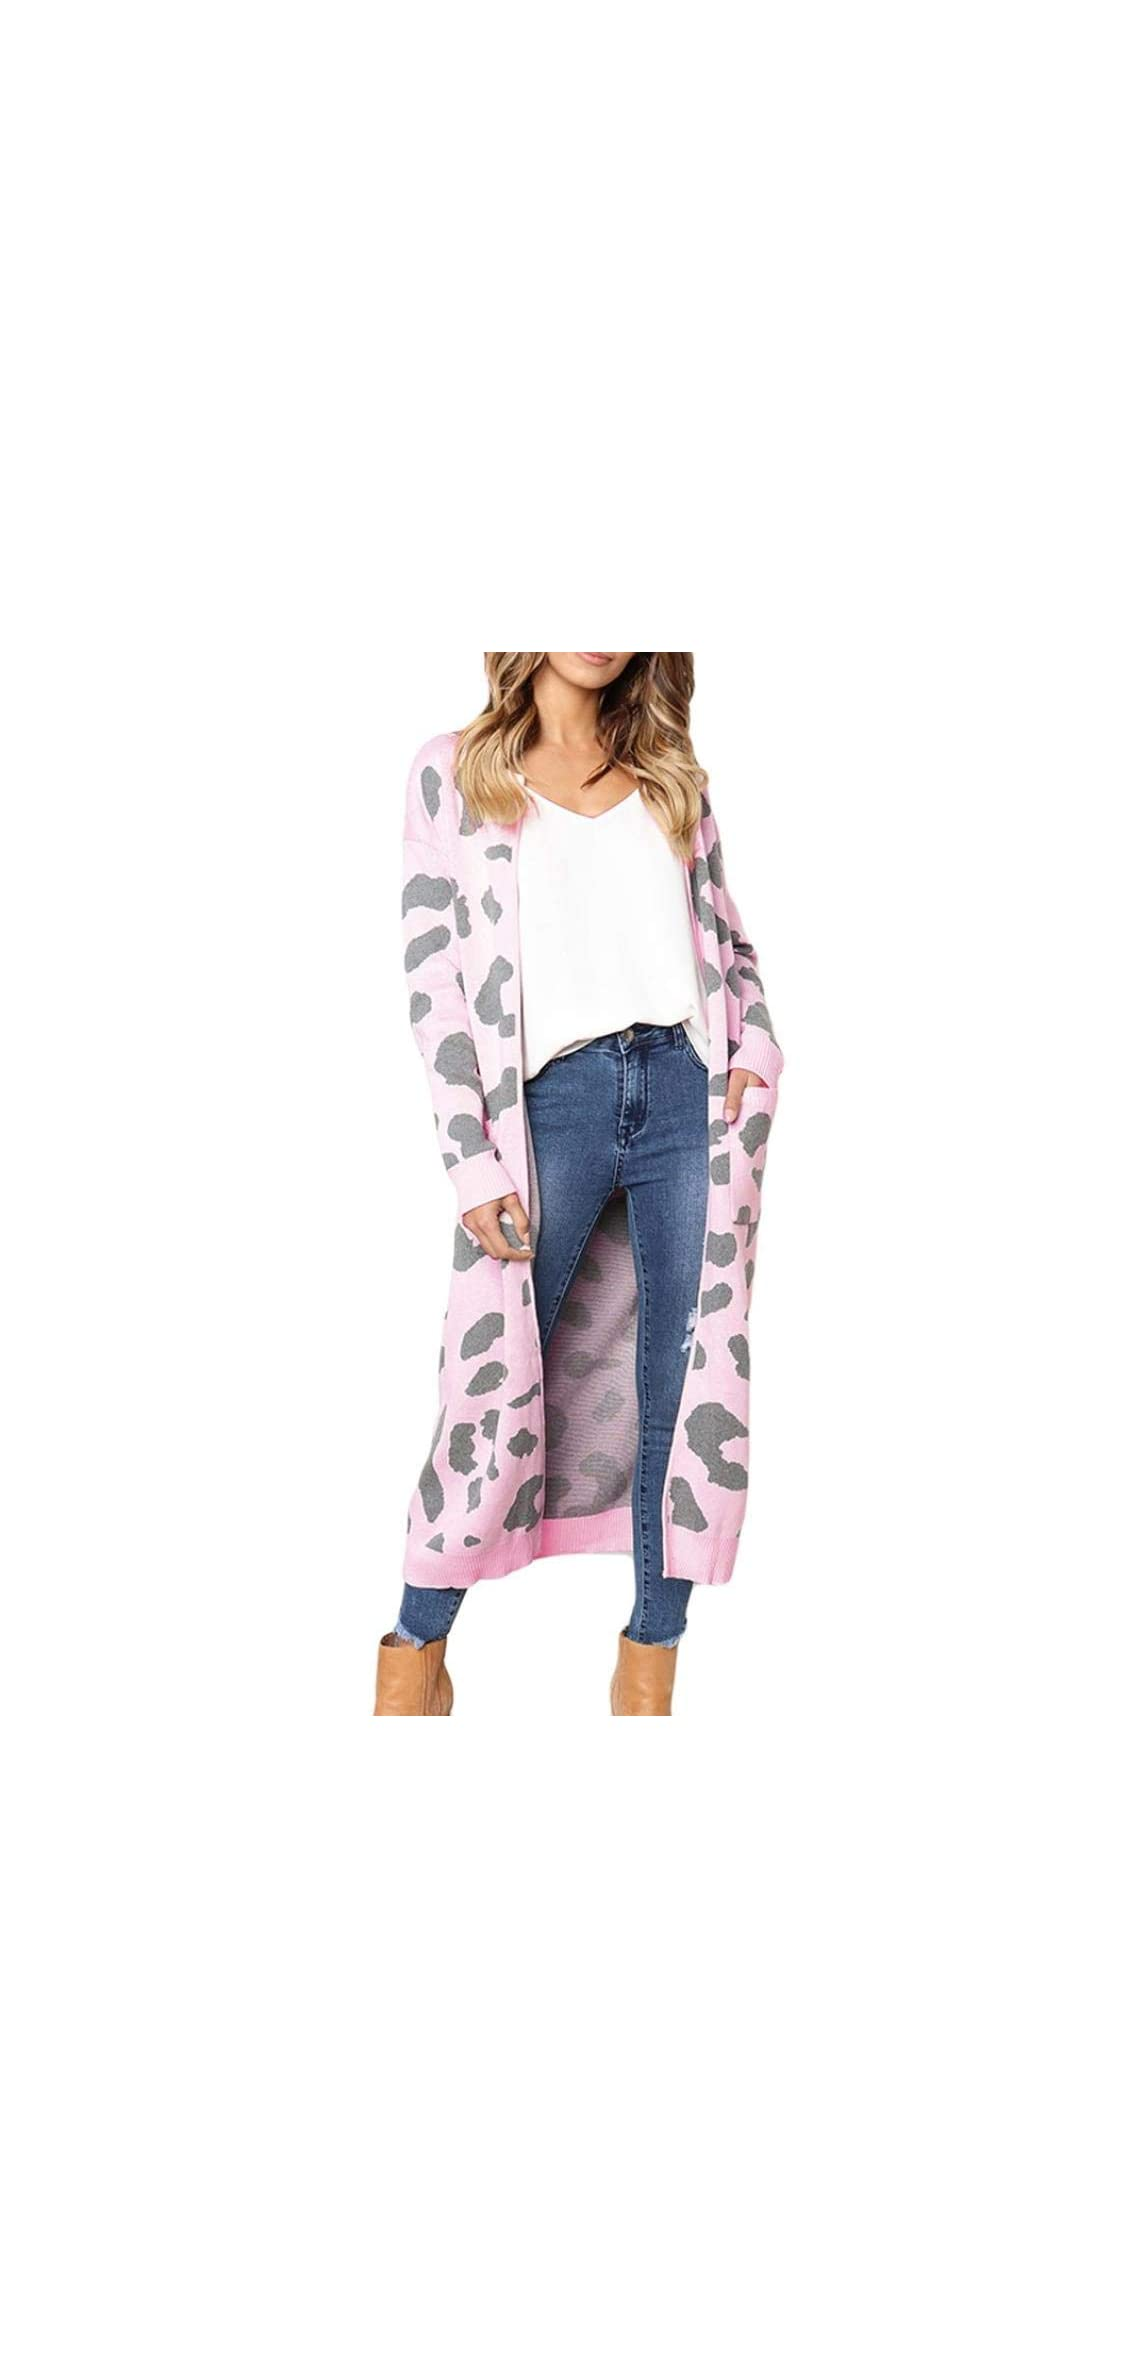 Fashion Women's Leopard Print Long-sleeved Cardigan